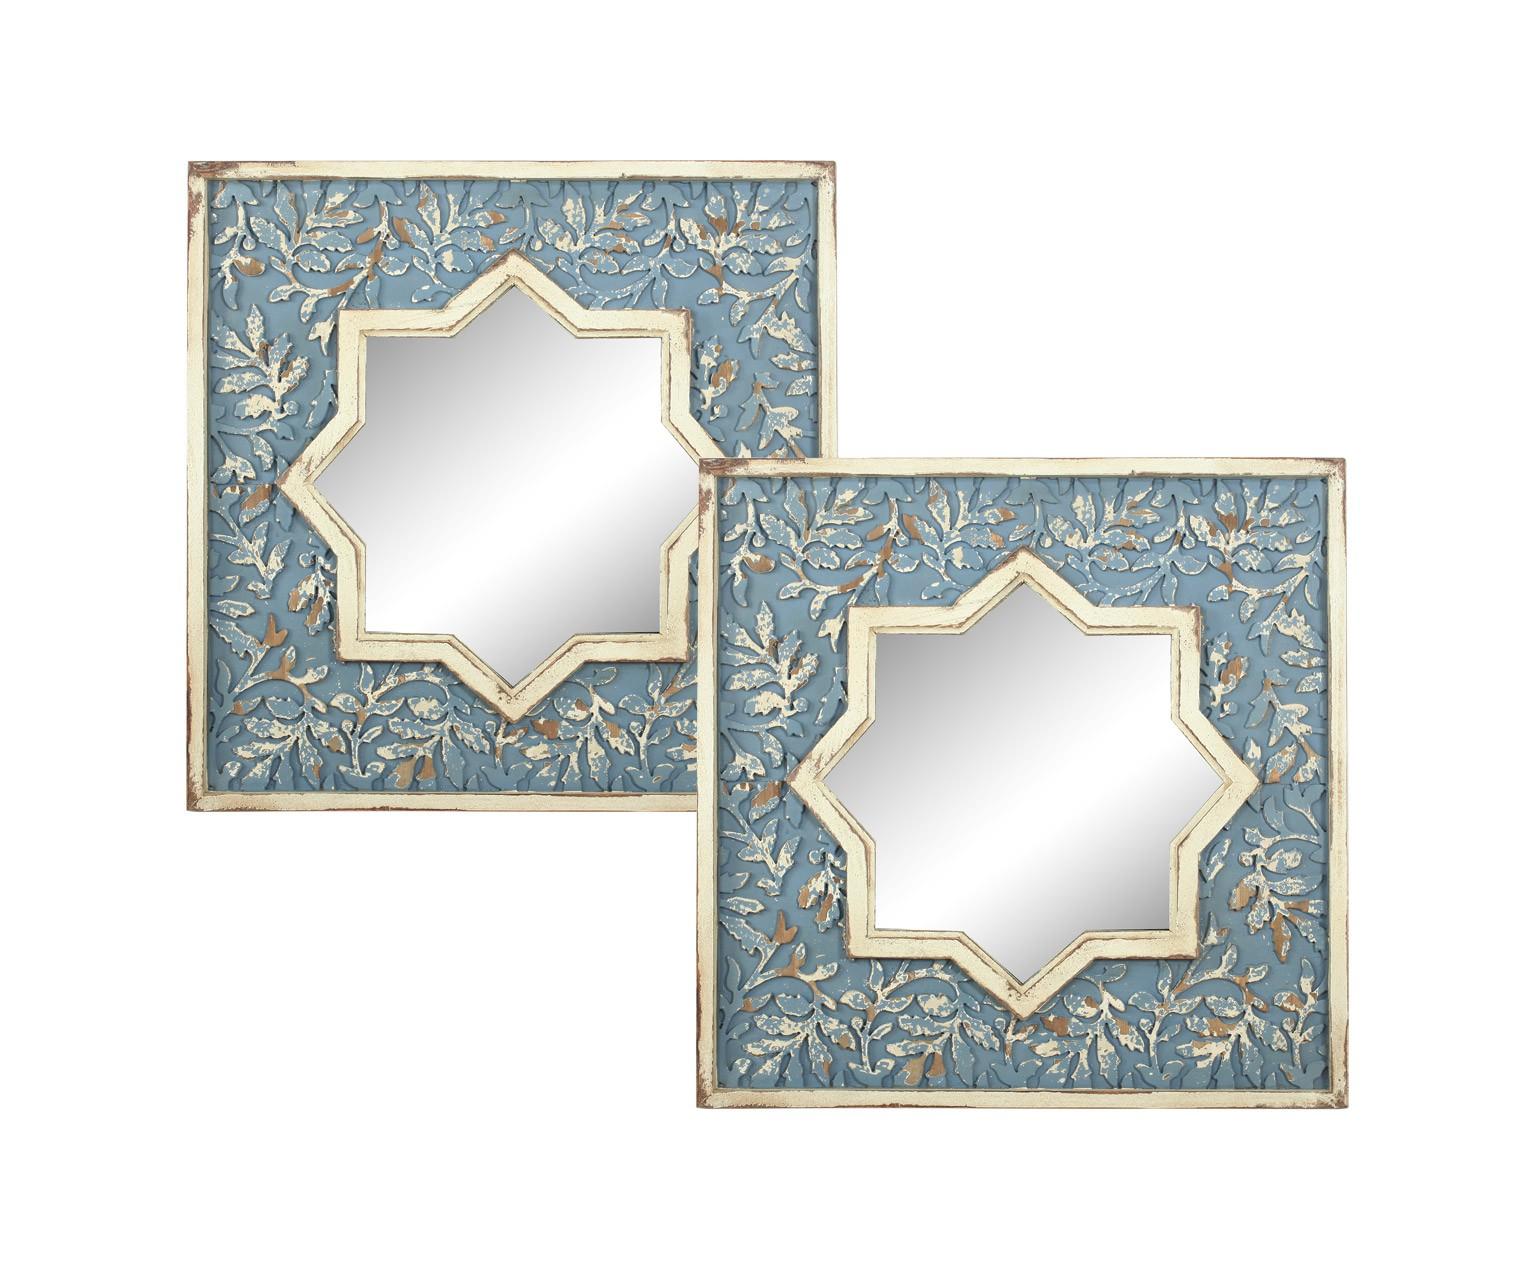 Зеркало (2шт)Настенные зеркала<br><br><br>Material: Дерево<br>Width см: 71<br>Depth см: 4<br>Height см: 71